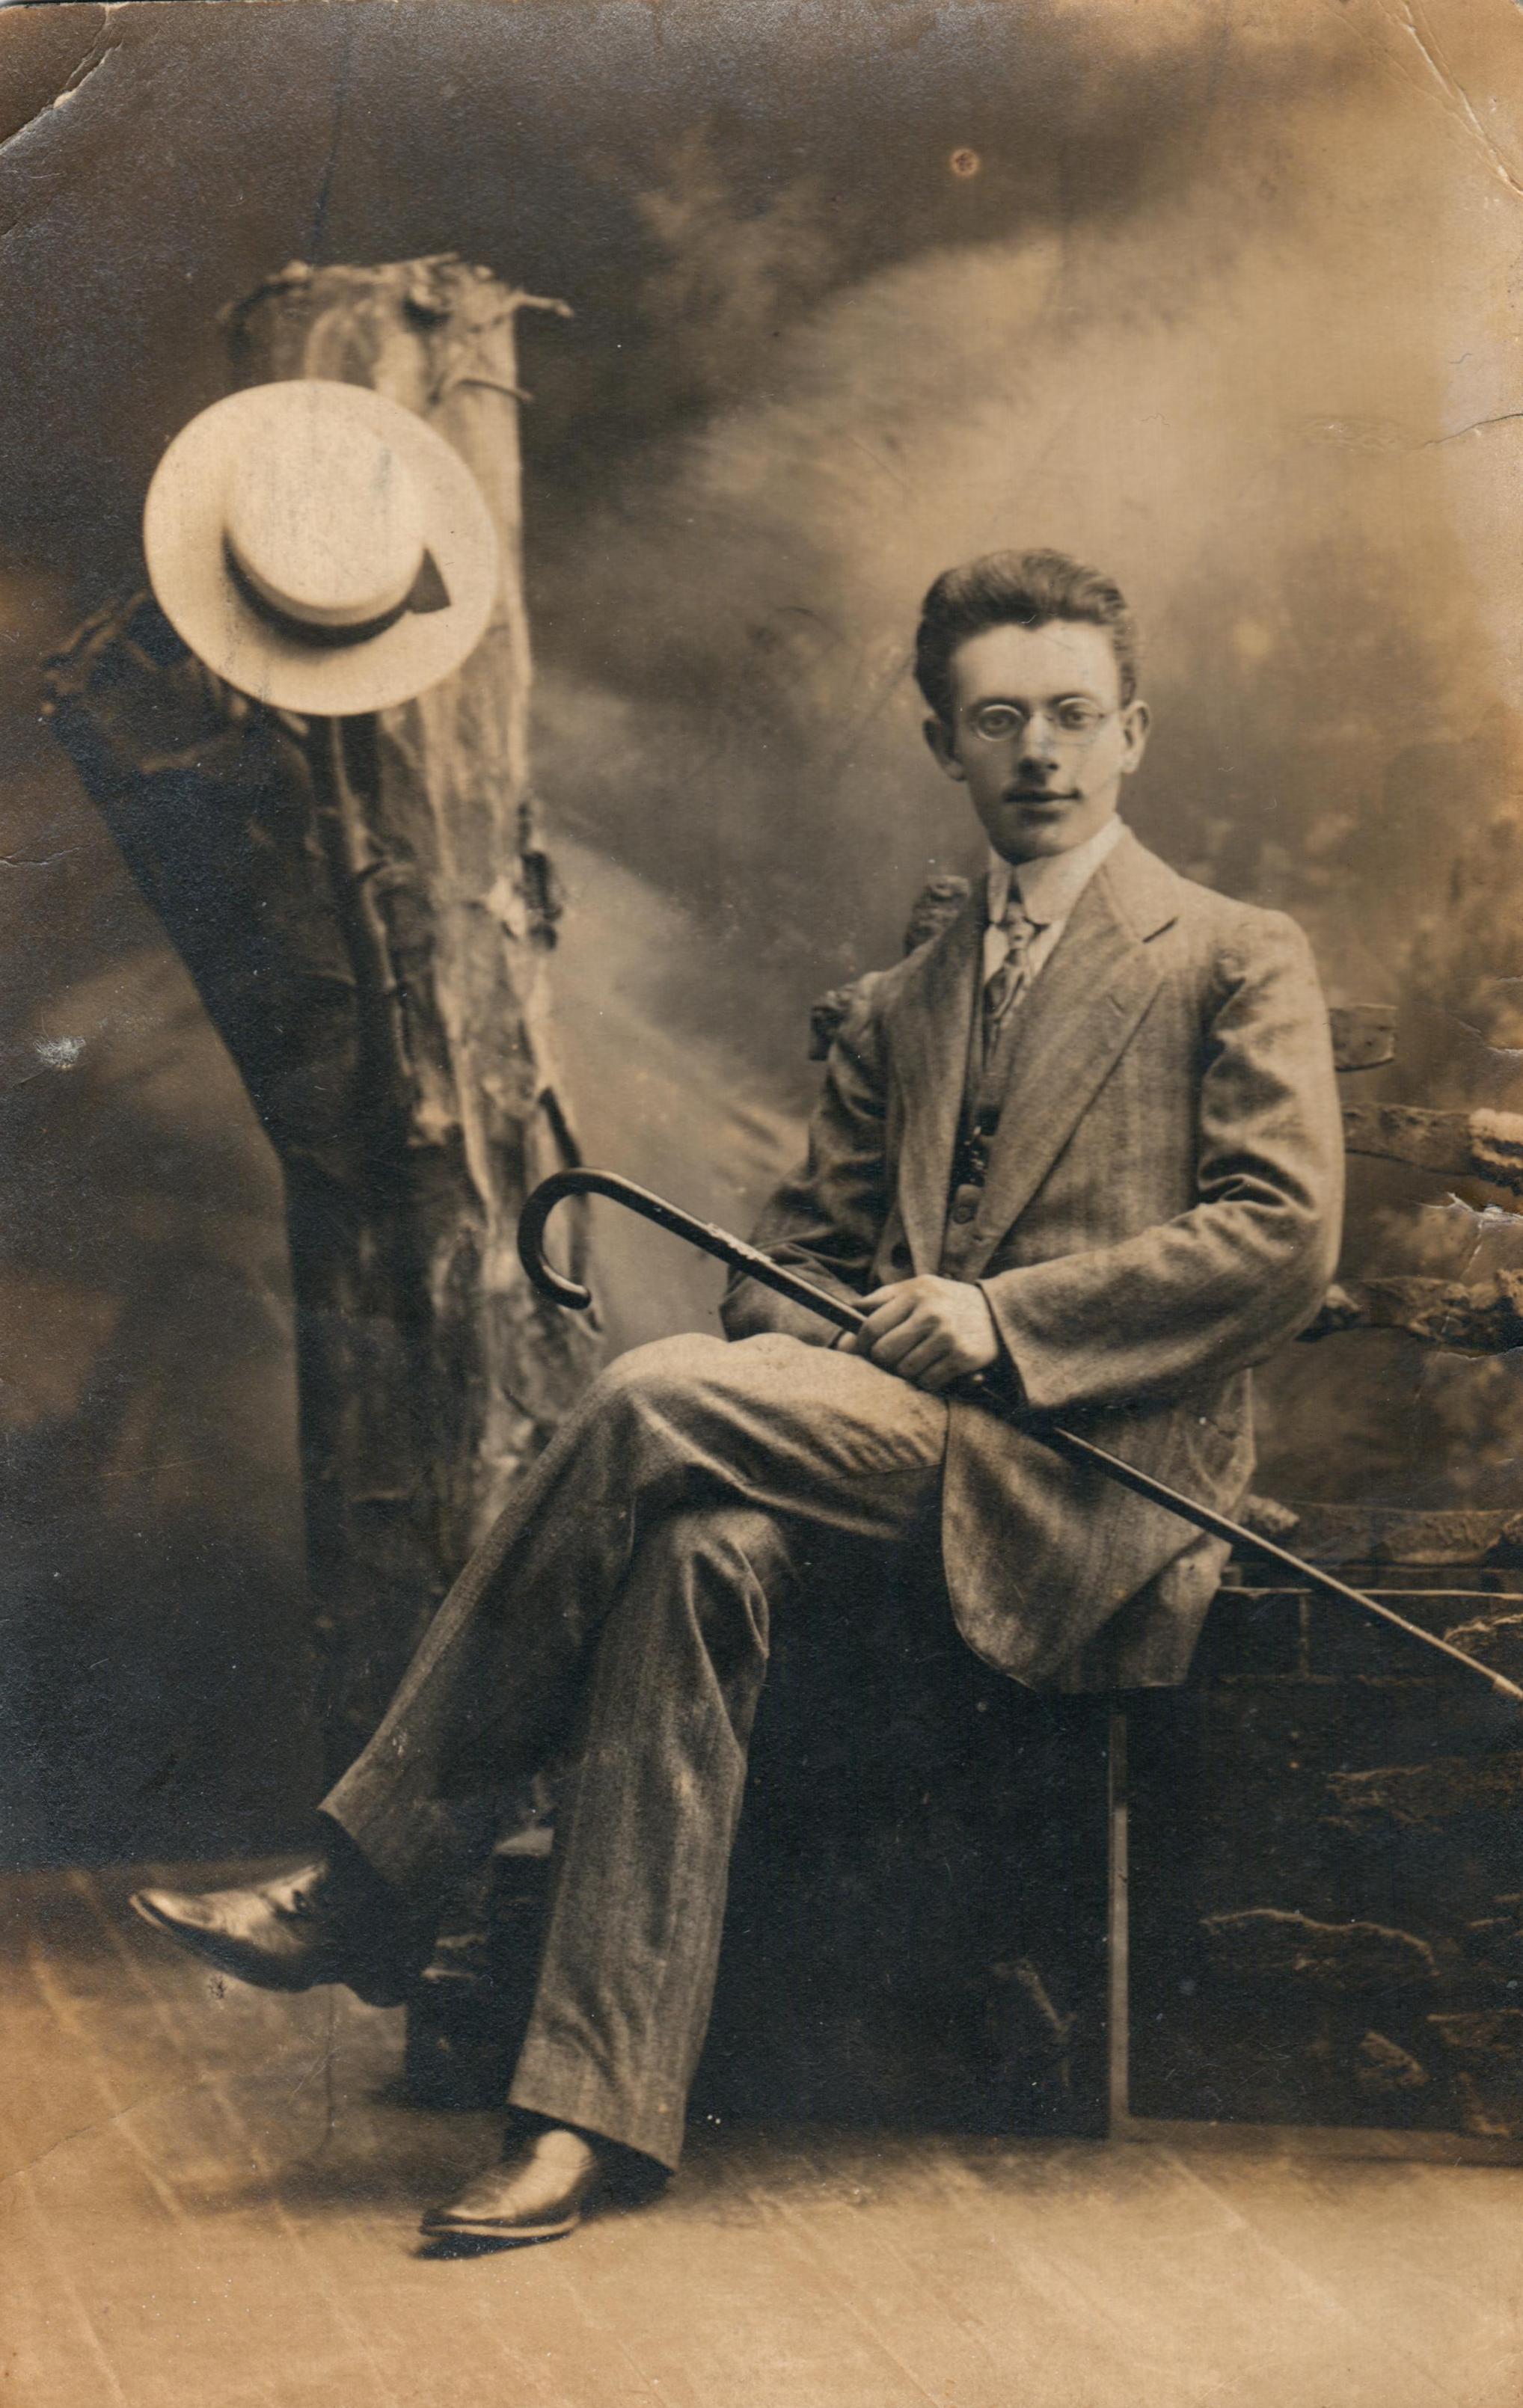 Мой прадед, Лев Овсеевич Натанзон. Белосток, 1912 год